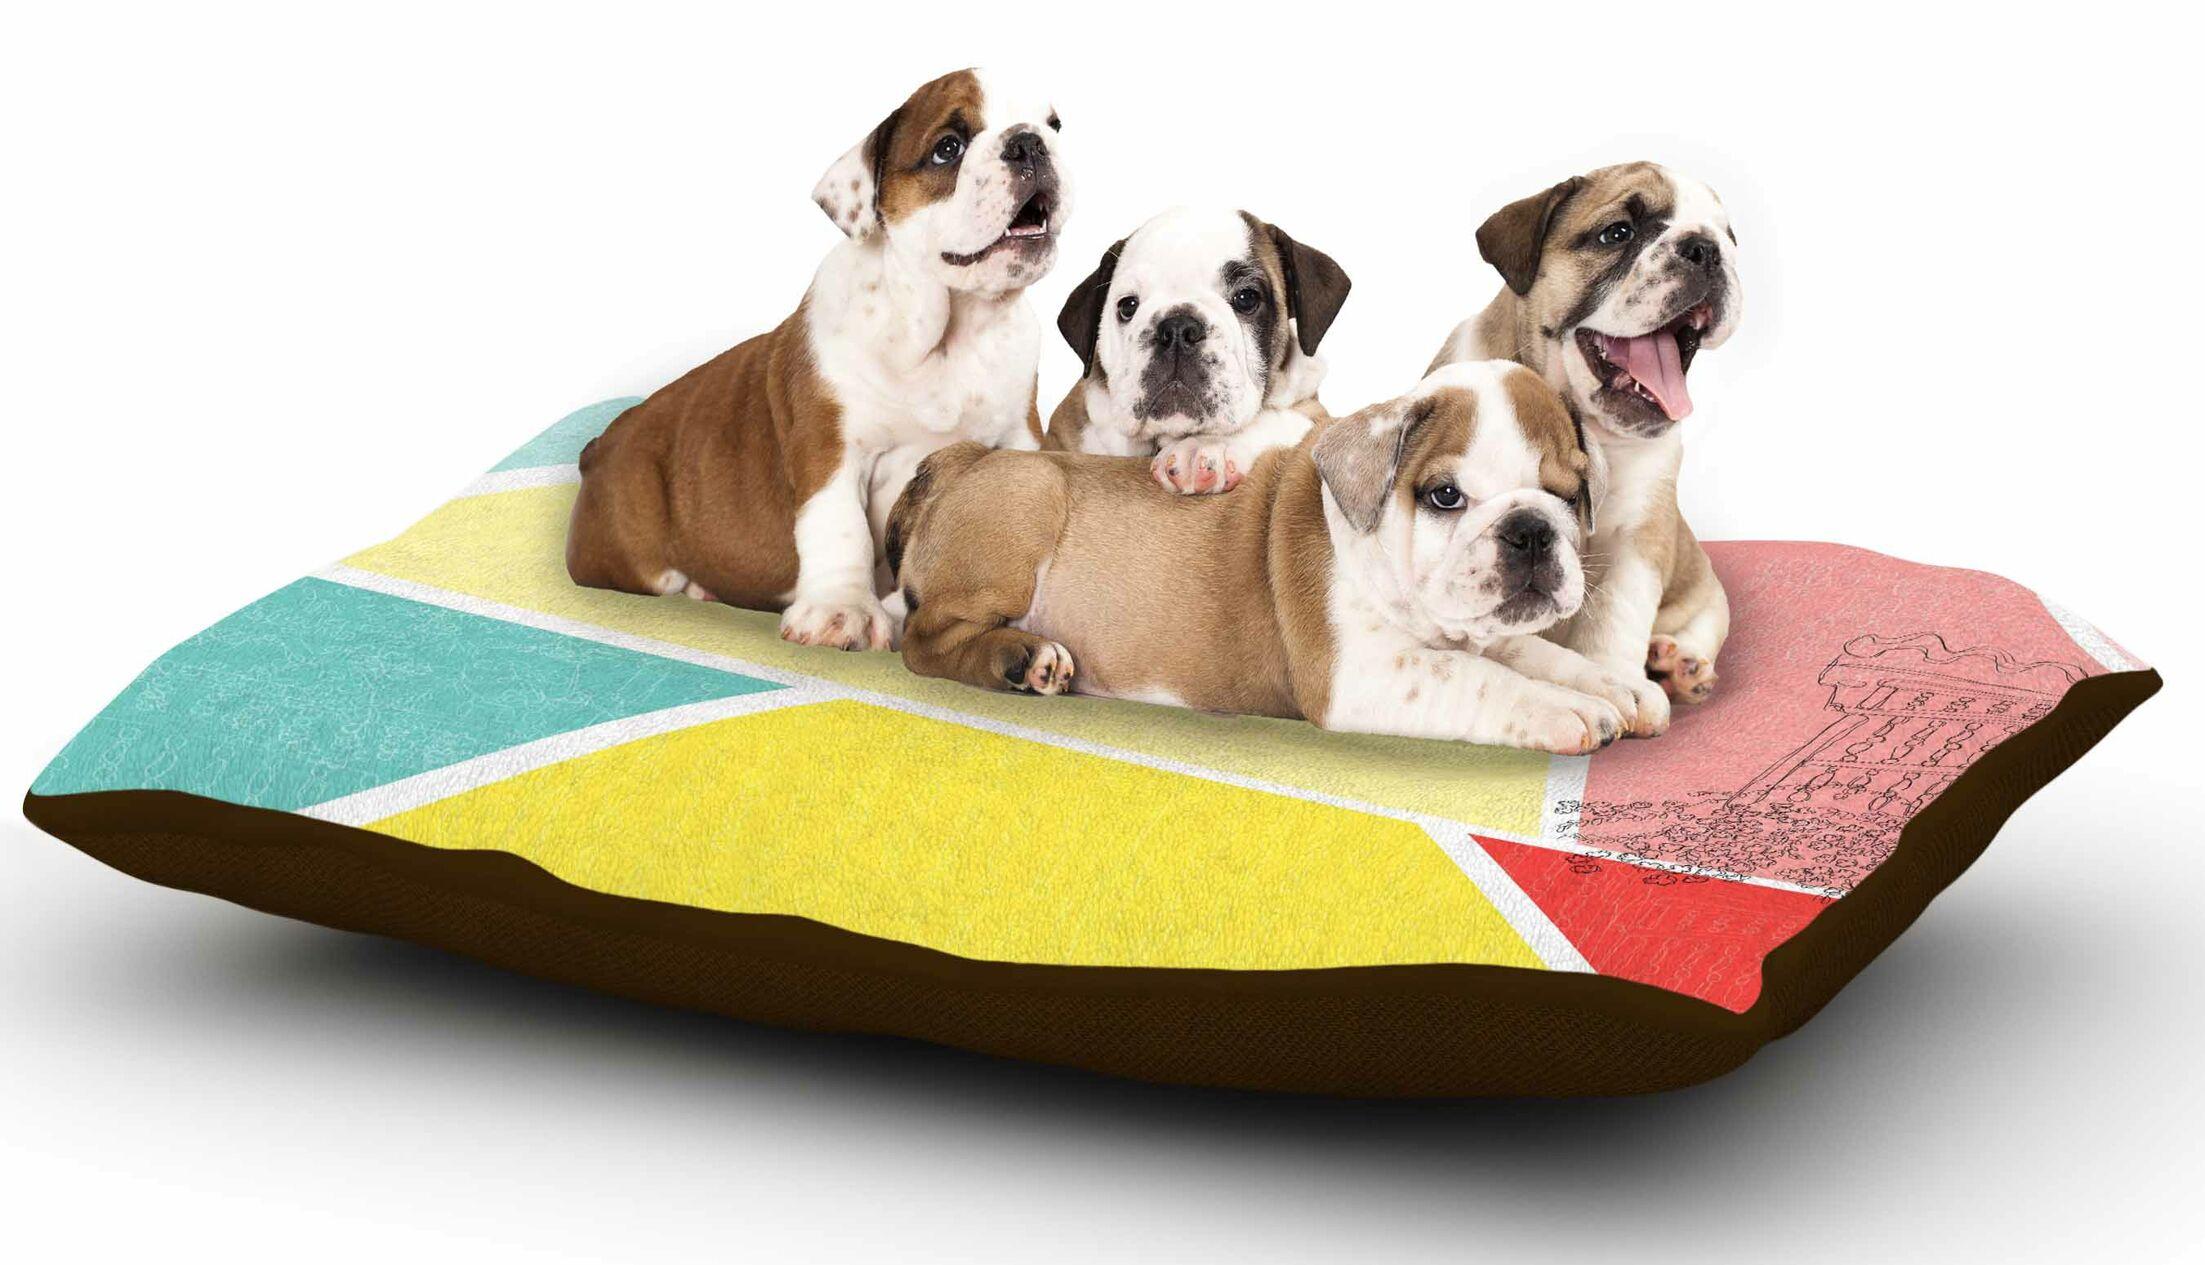 MaJoBV 'Cartagena Balconies' Dog Pillow with Fleece Cozy Top